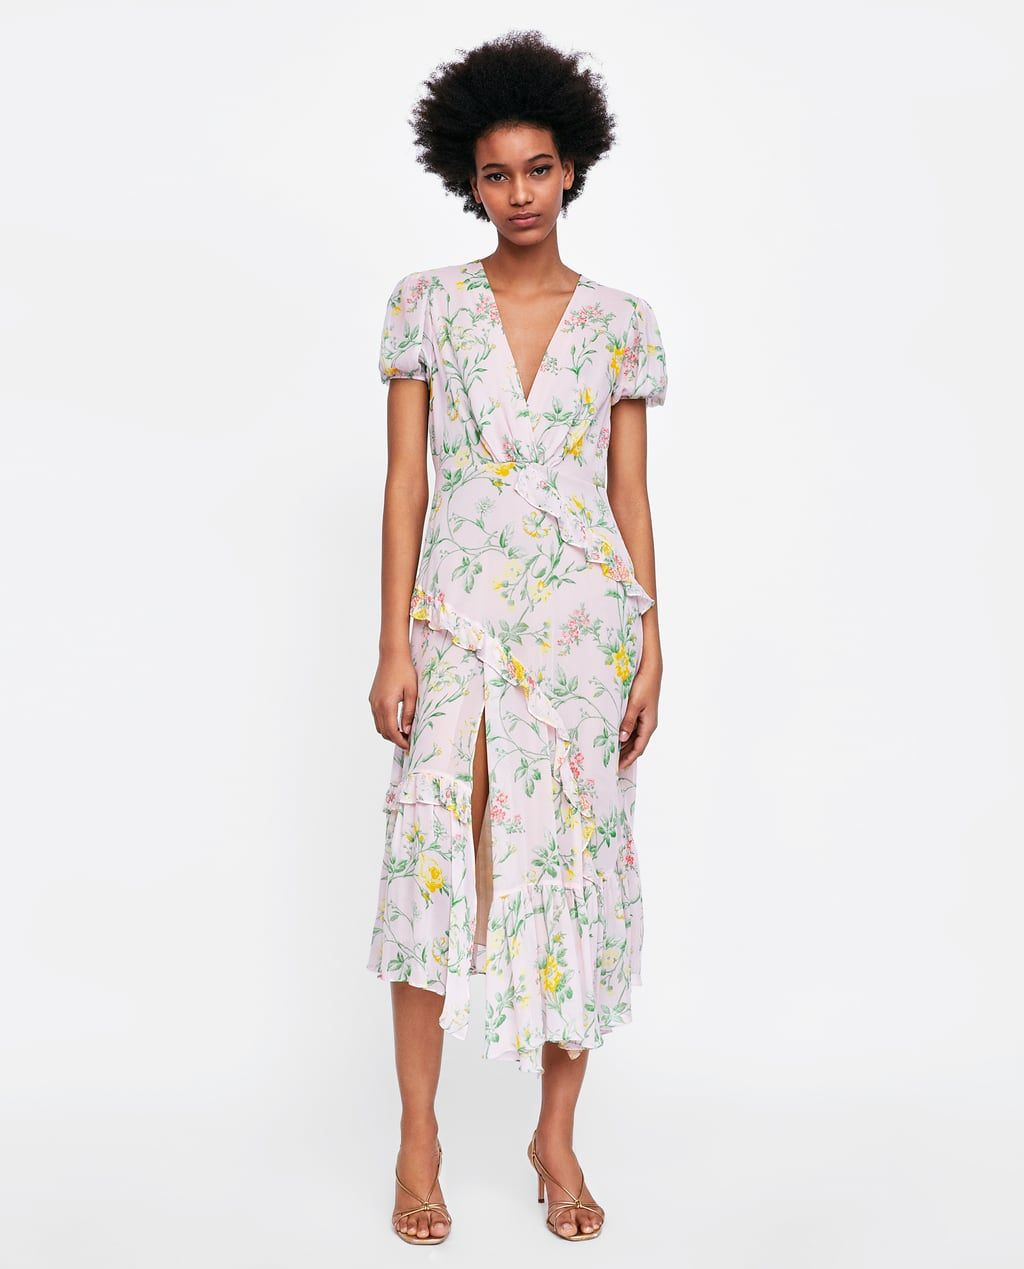 ZARA - WOMAN - RUFFLED FLORAL PRINT DRESS  Blumendruck kleider